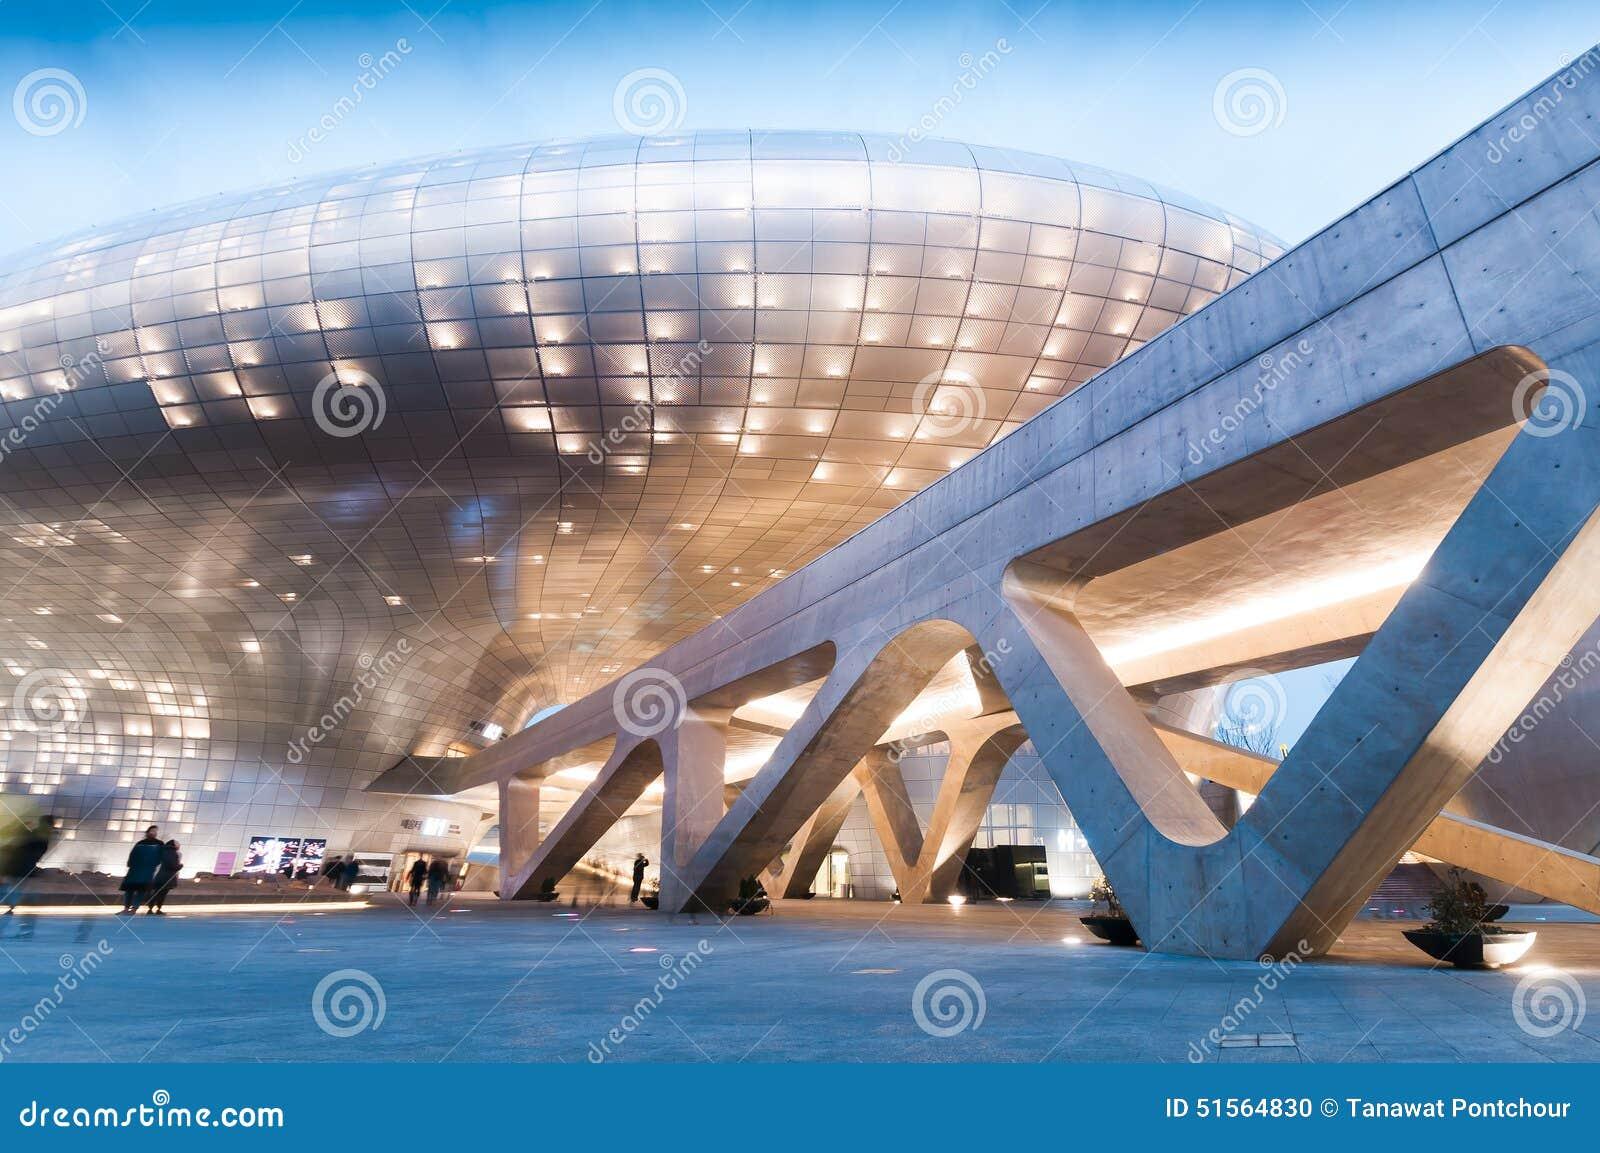 Dongdaemun design plaza editorial image image of famous for Modern house design korea